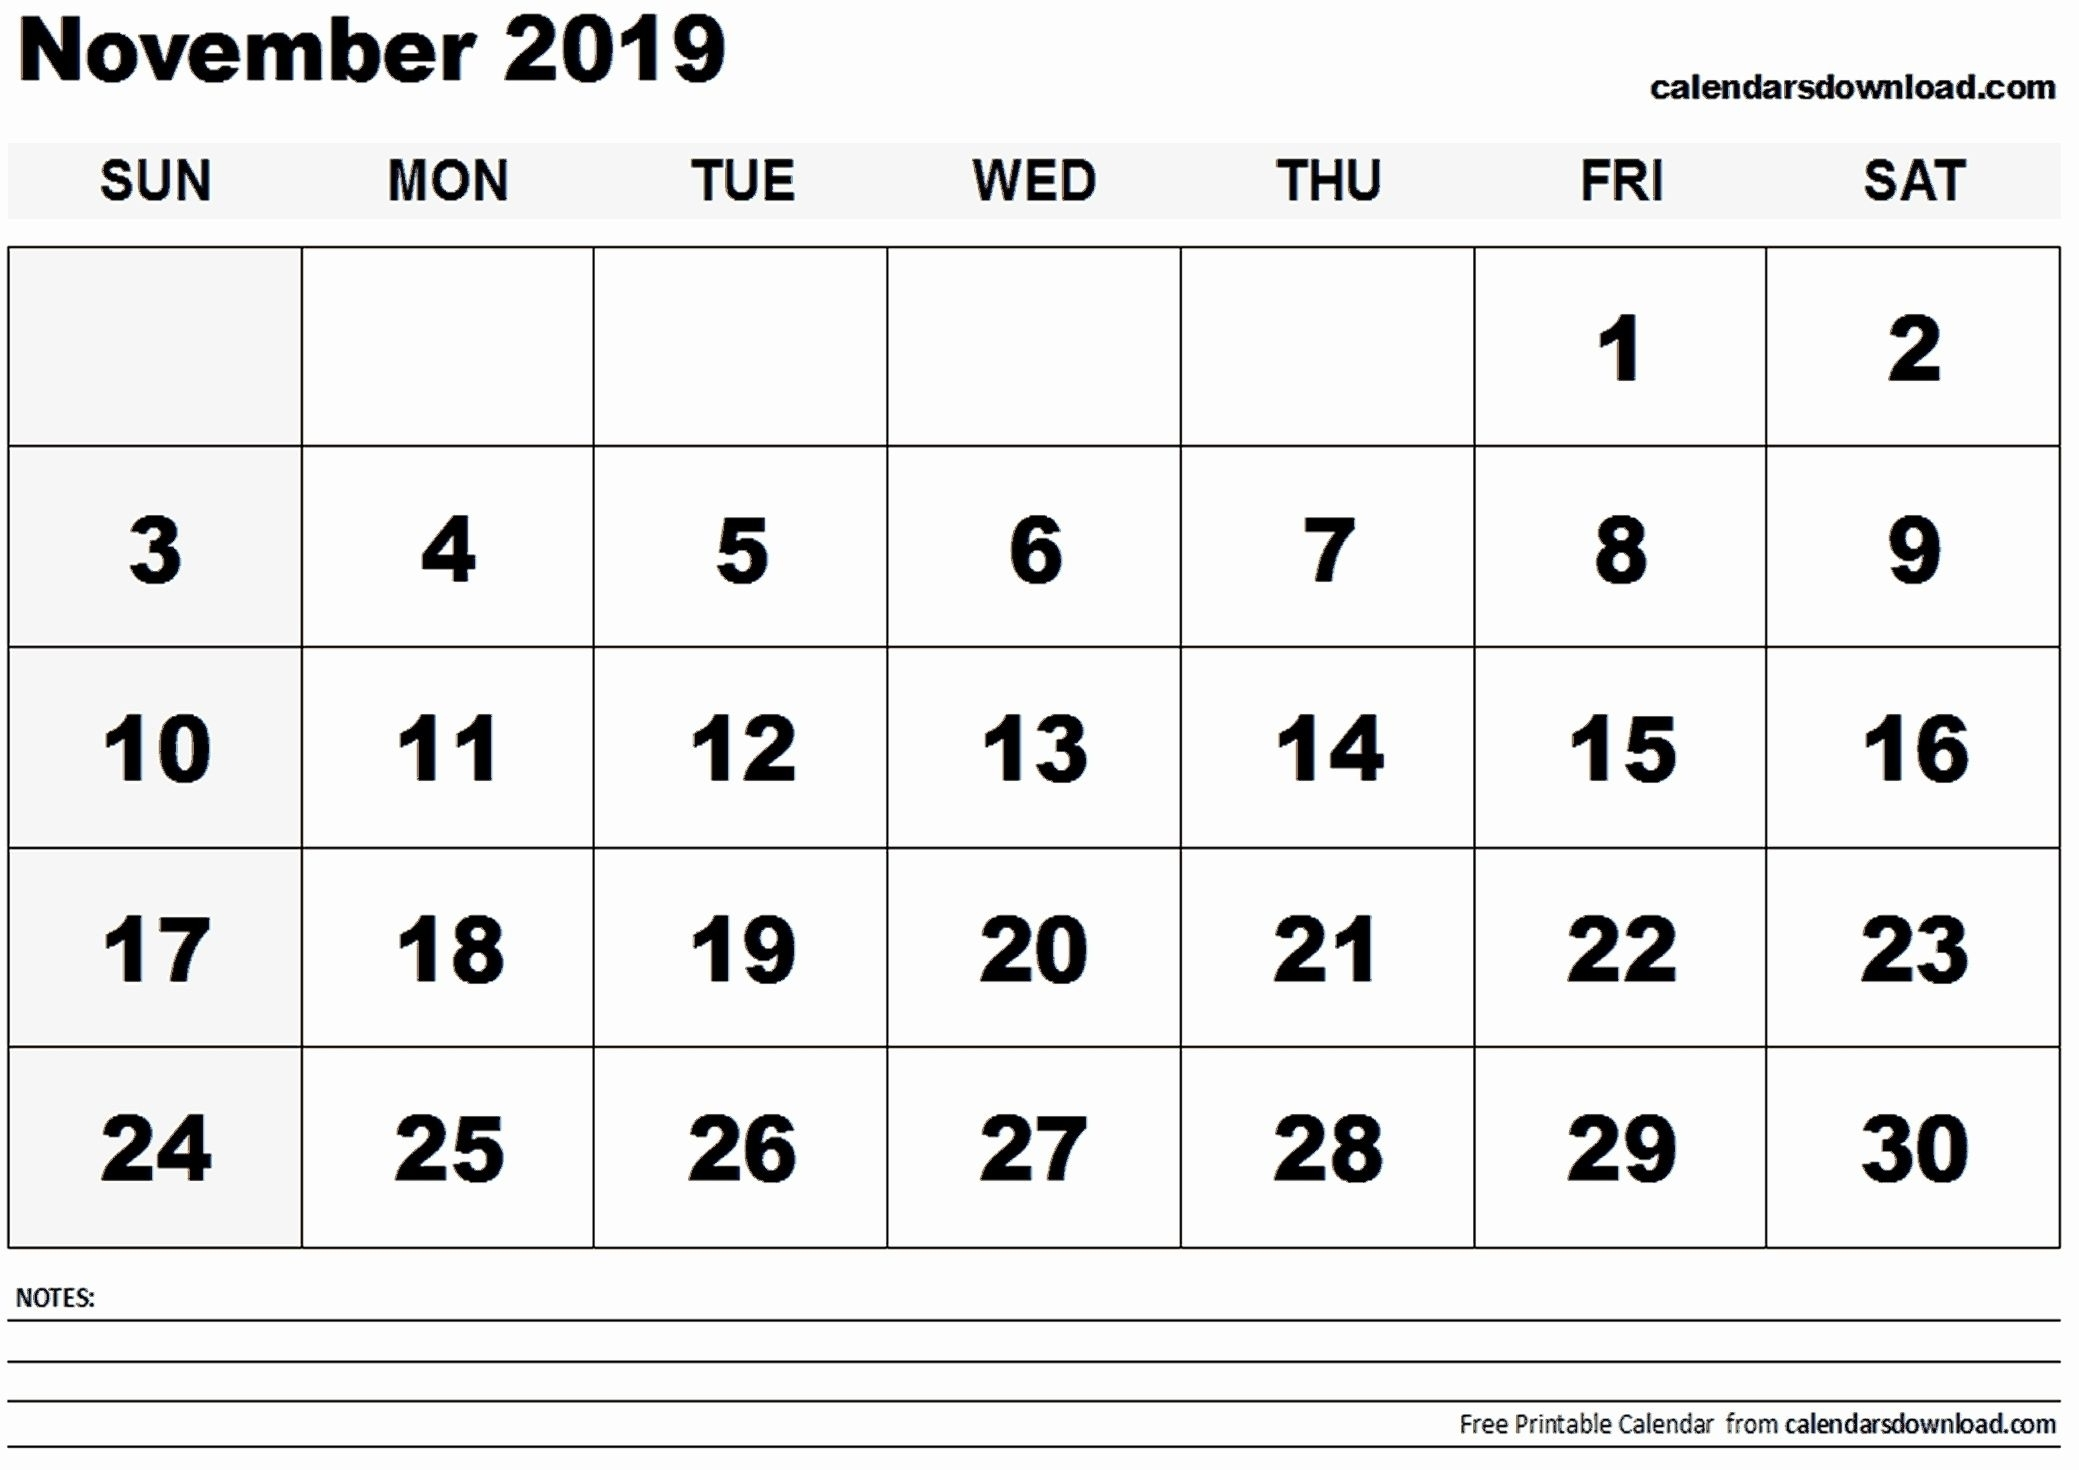 Get November Calender Full Size